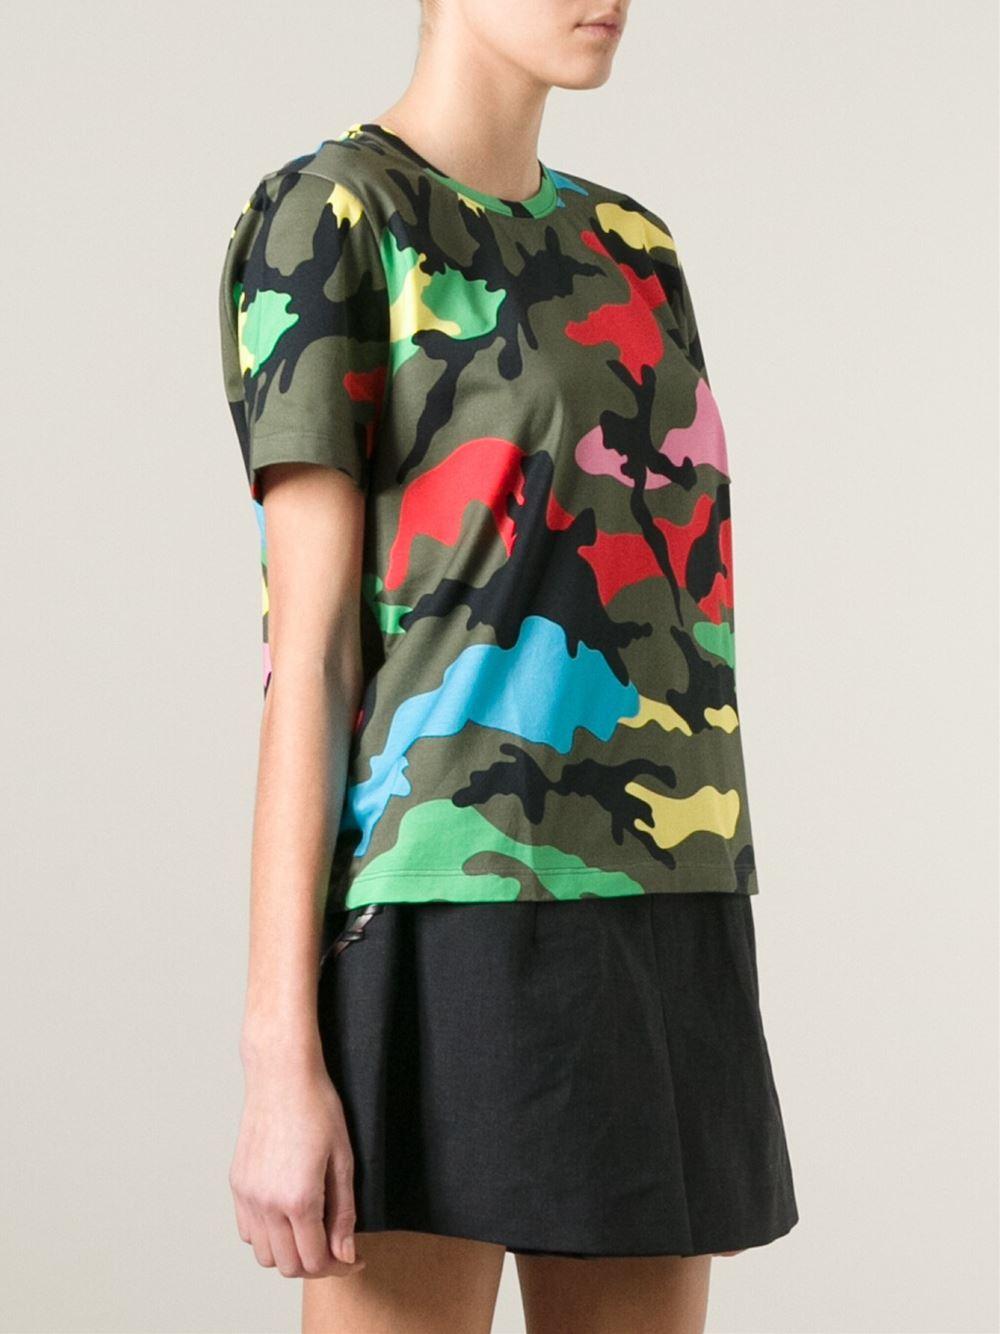 9f291dfb Valentino 'Rockstud' Camouflage T-Shirt in Green - Lyst